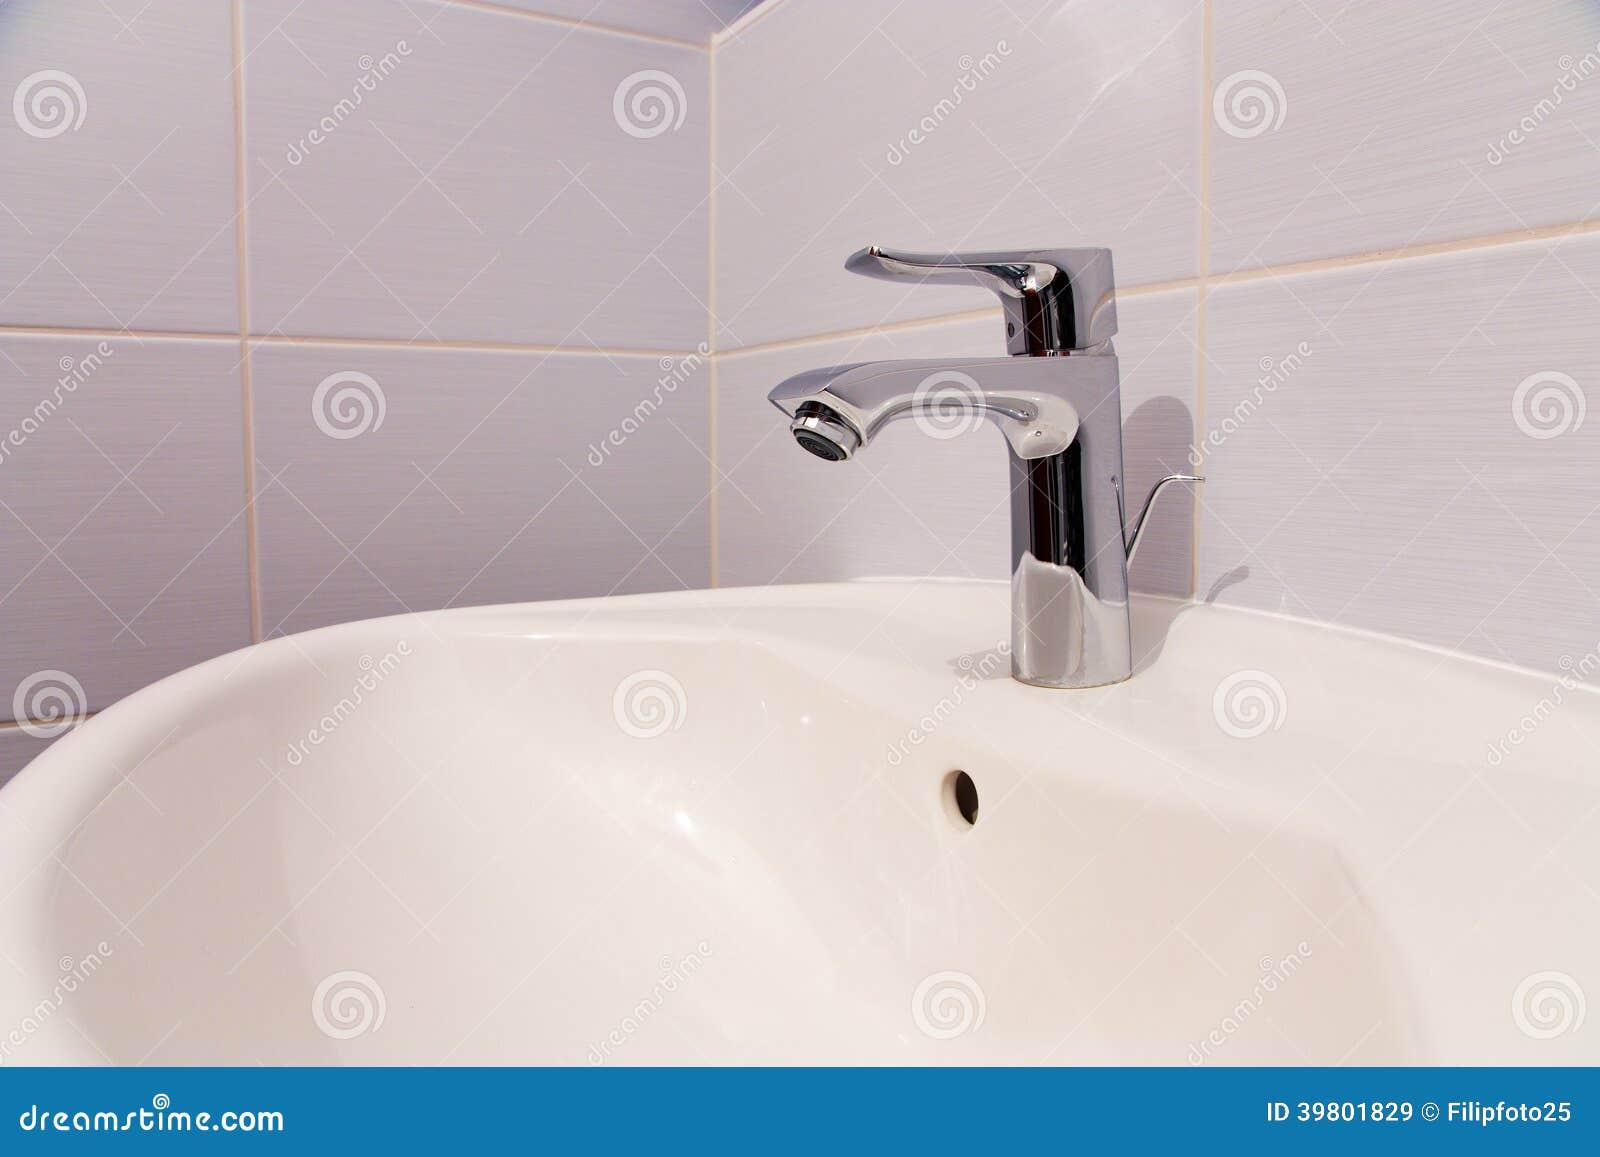 Bathroom tab stock image. Image of mixer, chrome, polished - 39801829